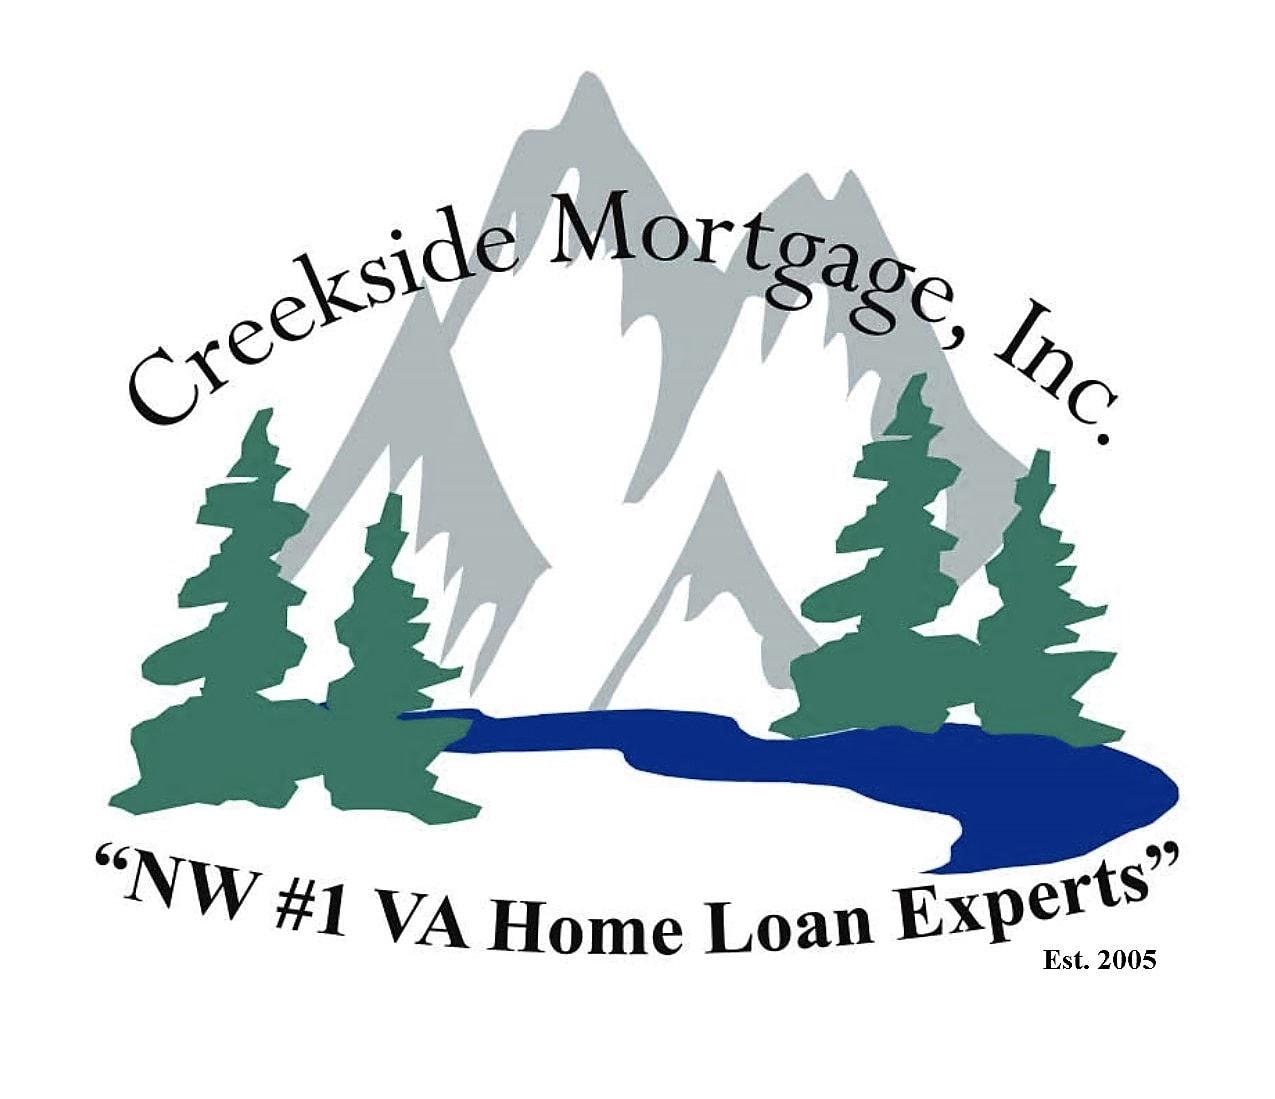 Creekside Mortgage Inc